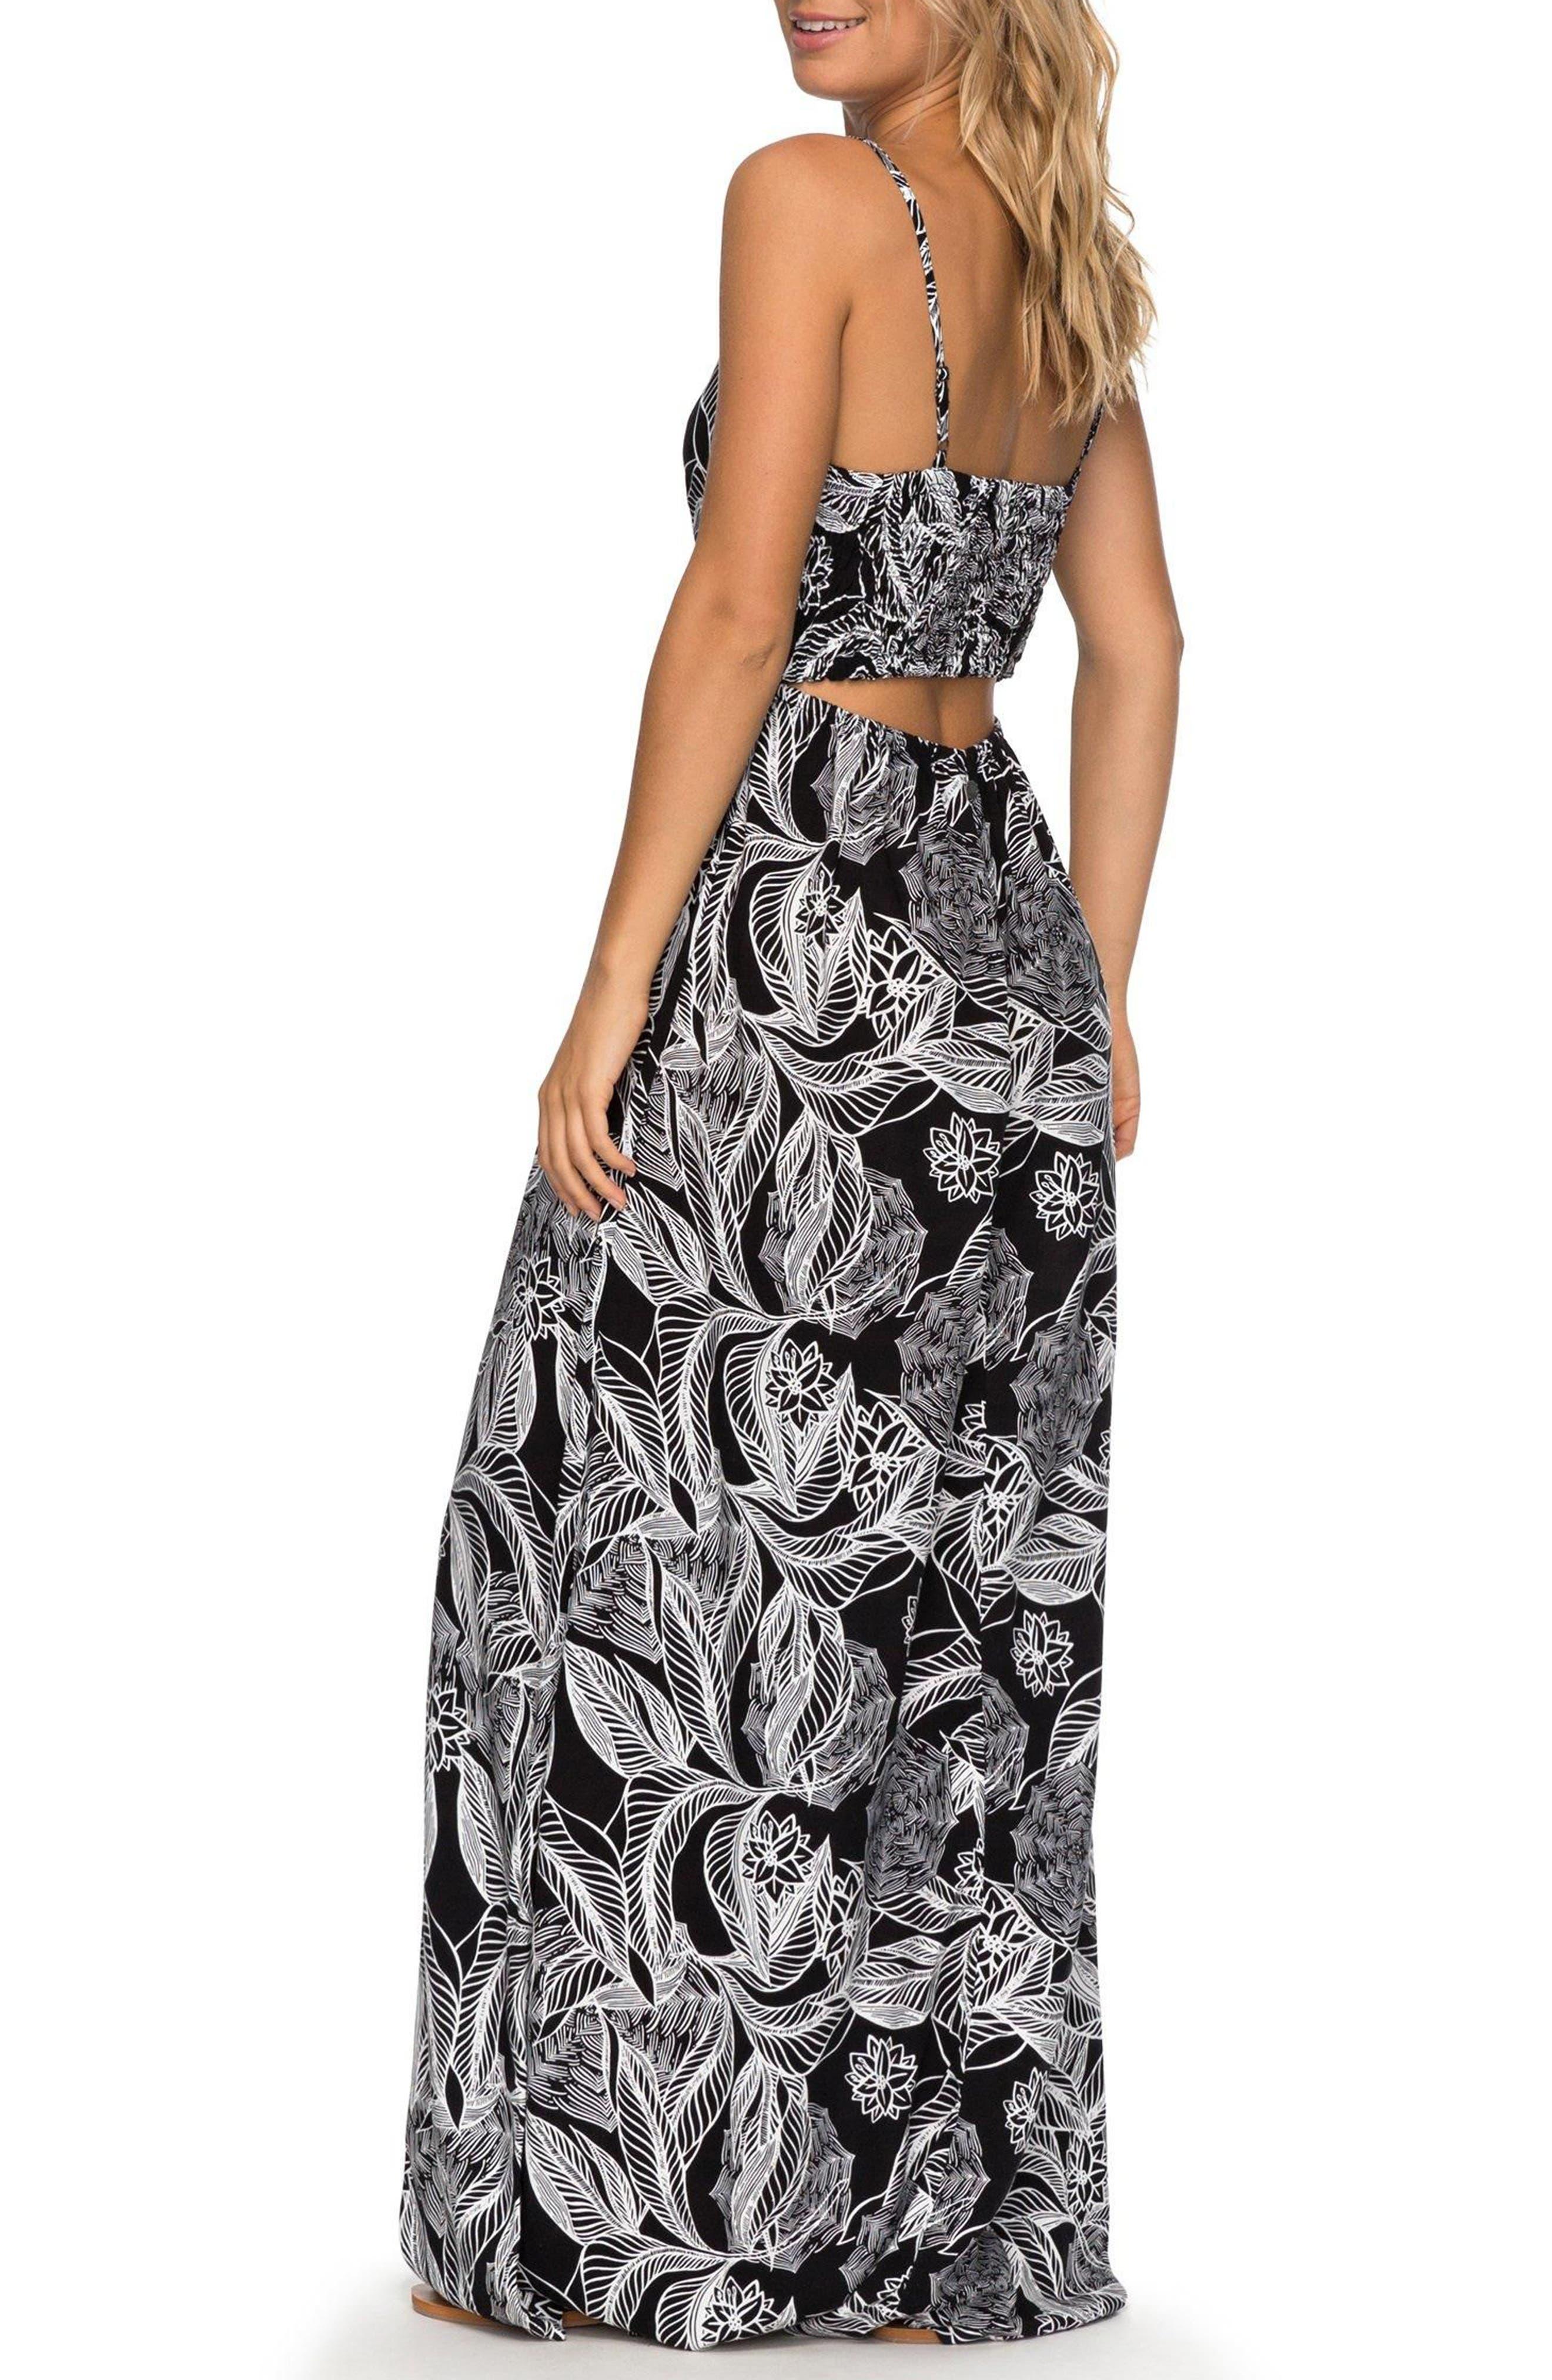 Brilliant Stars Print Maxi Dress,                             Alternate thumbnail 2, color,                             002